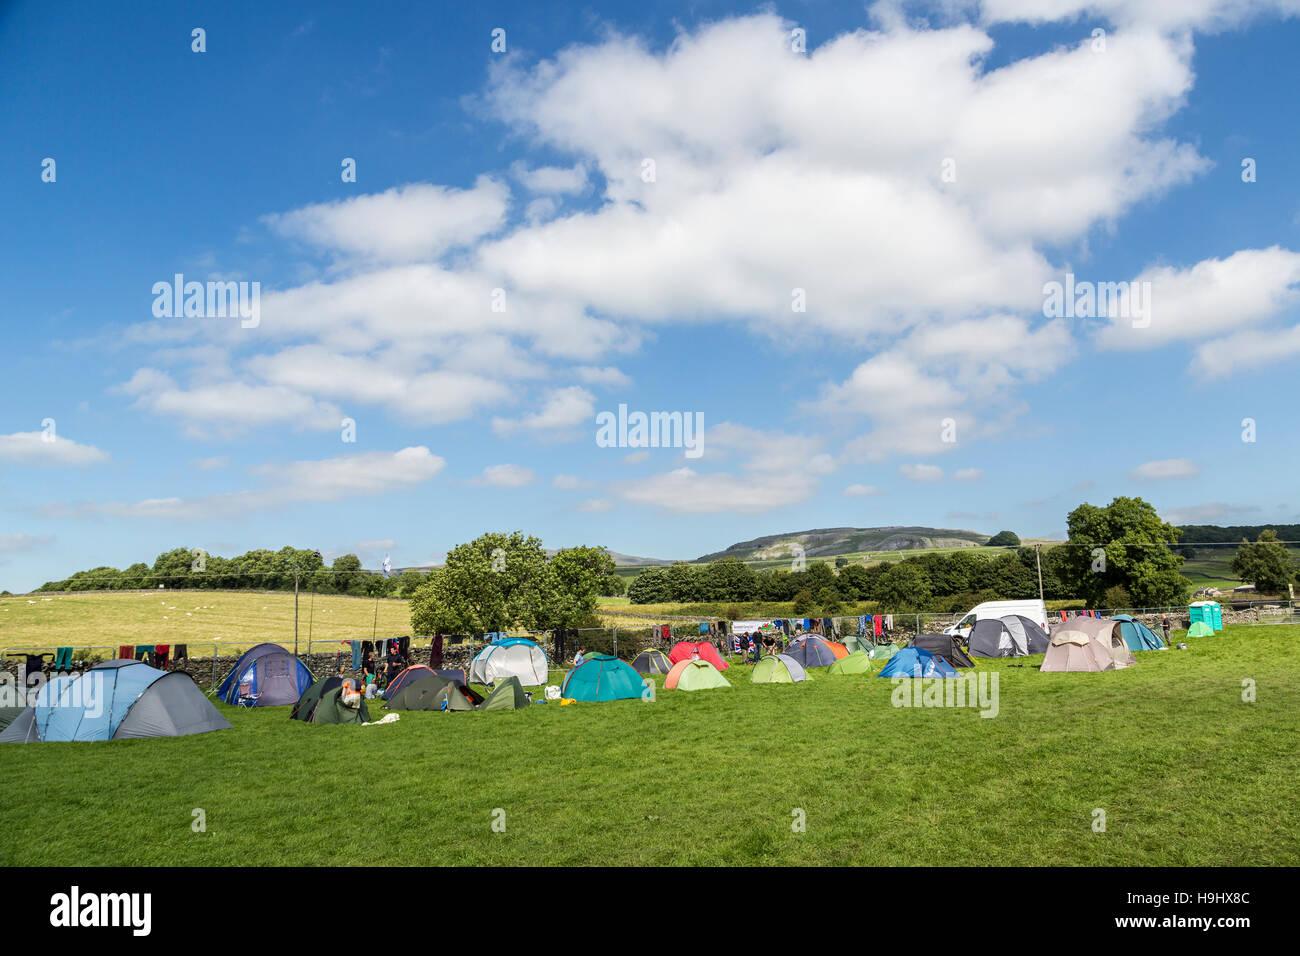 Campsite, Yorkshire, UK - Stock Image